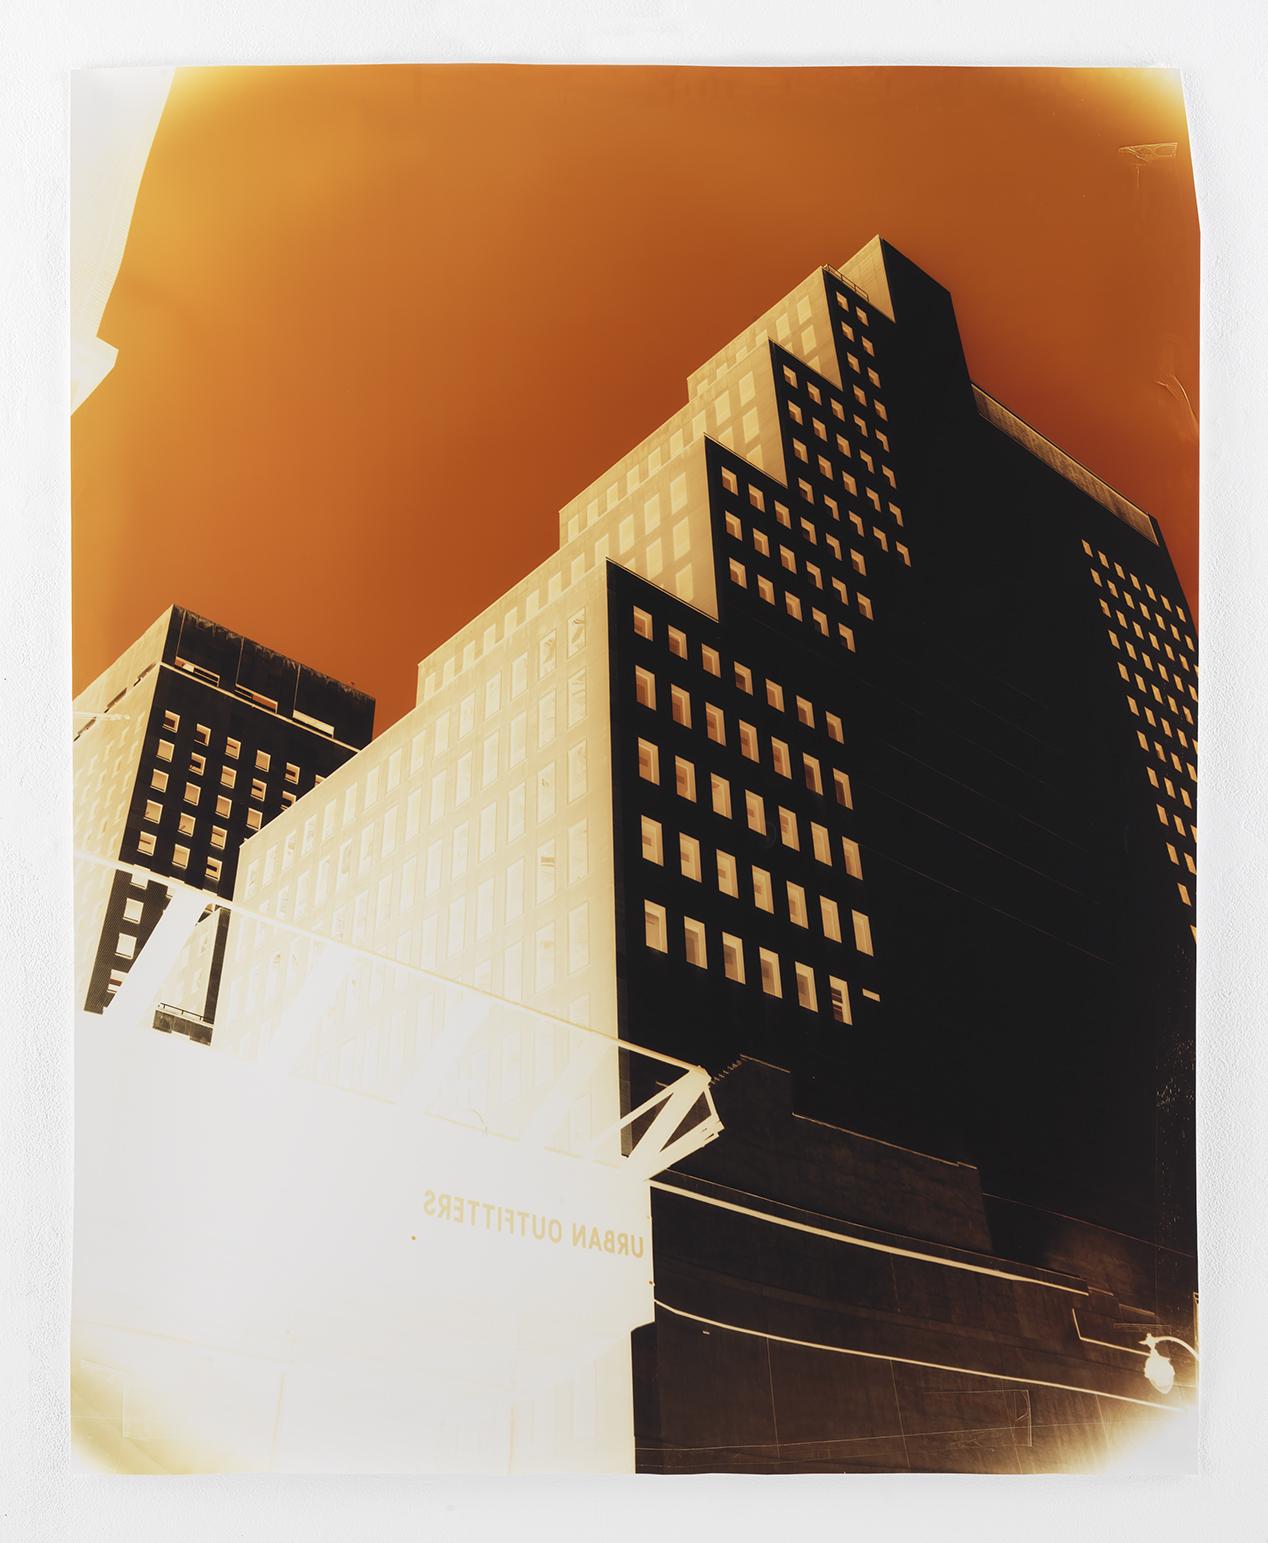 West 42nd Street at 5th Avenue  , 2018. Negative Chromogenic Photograph  Collection of John Chiara. © John Chiara